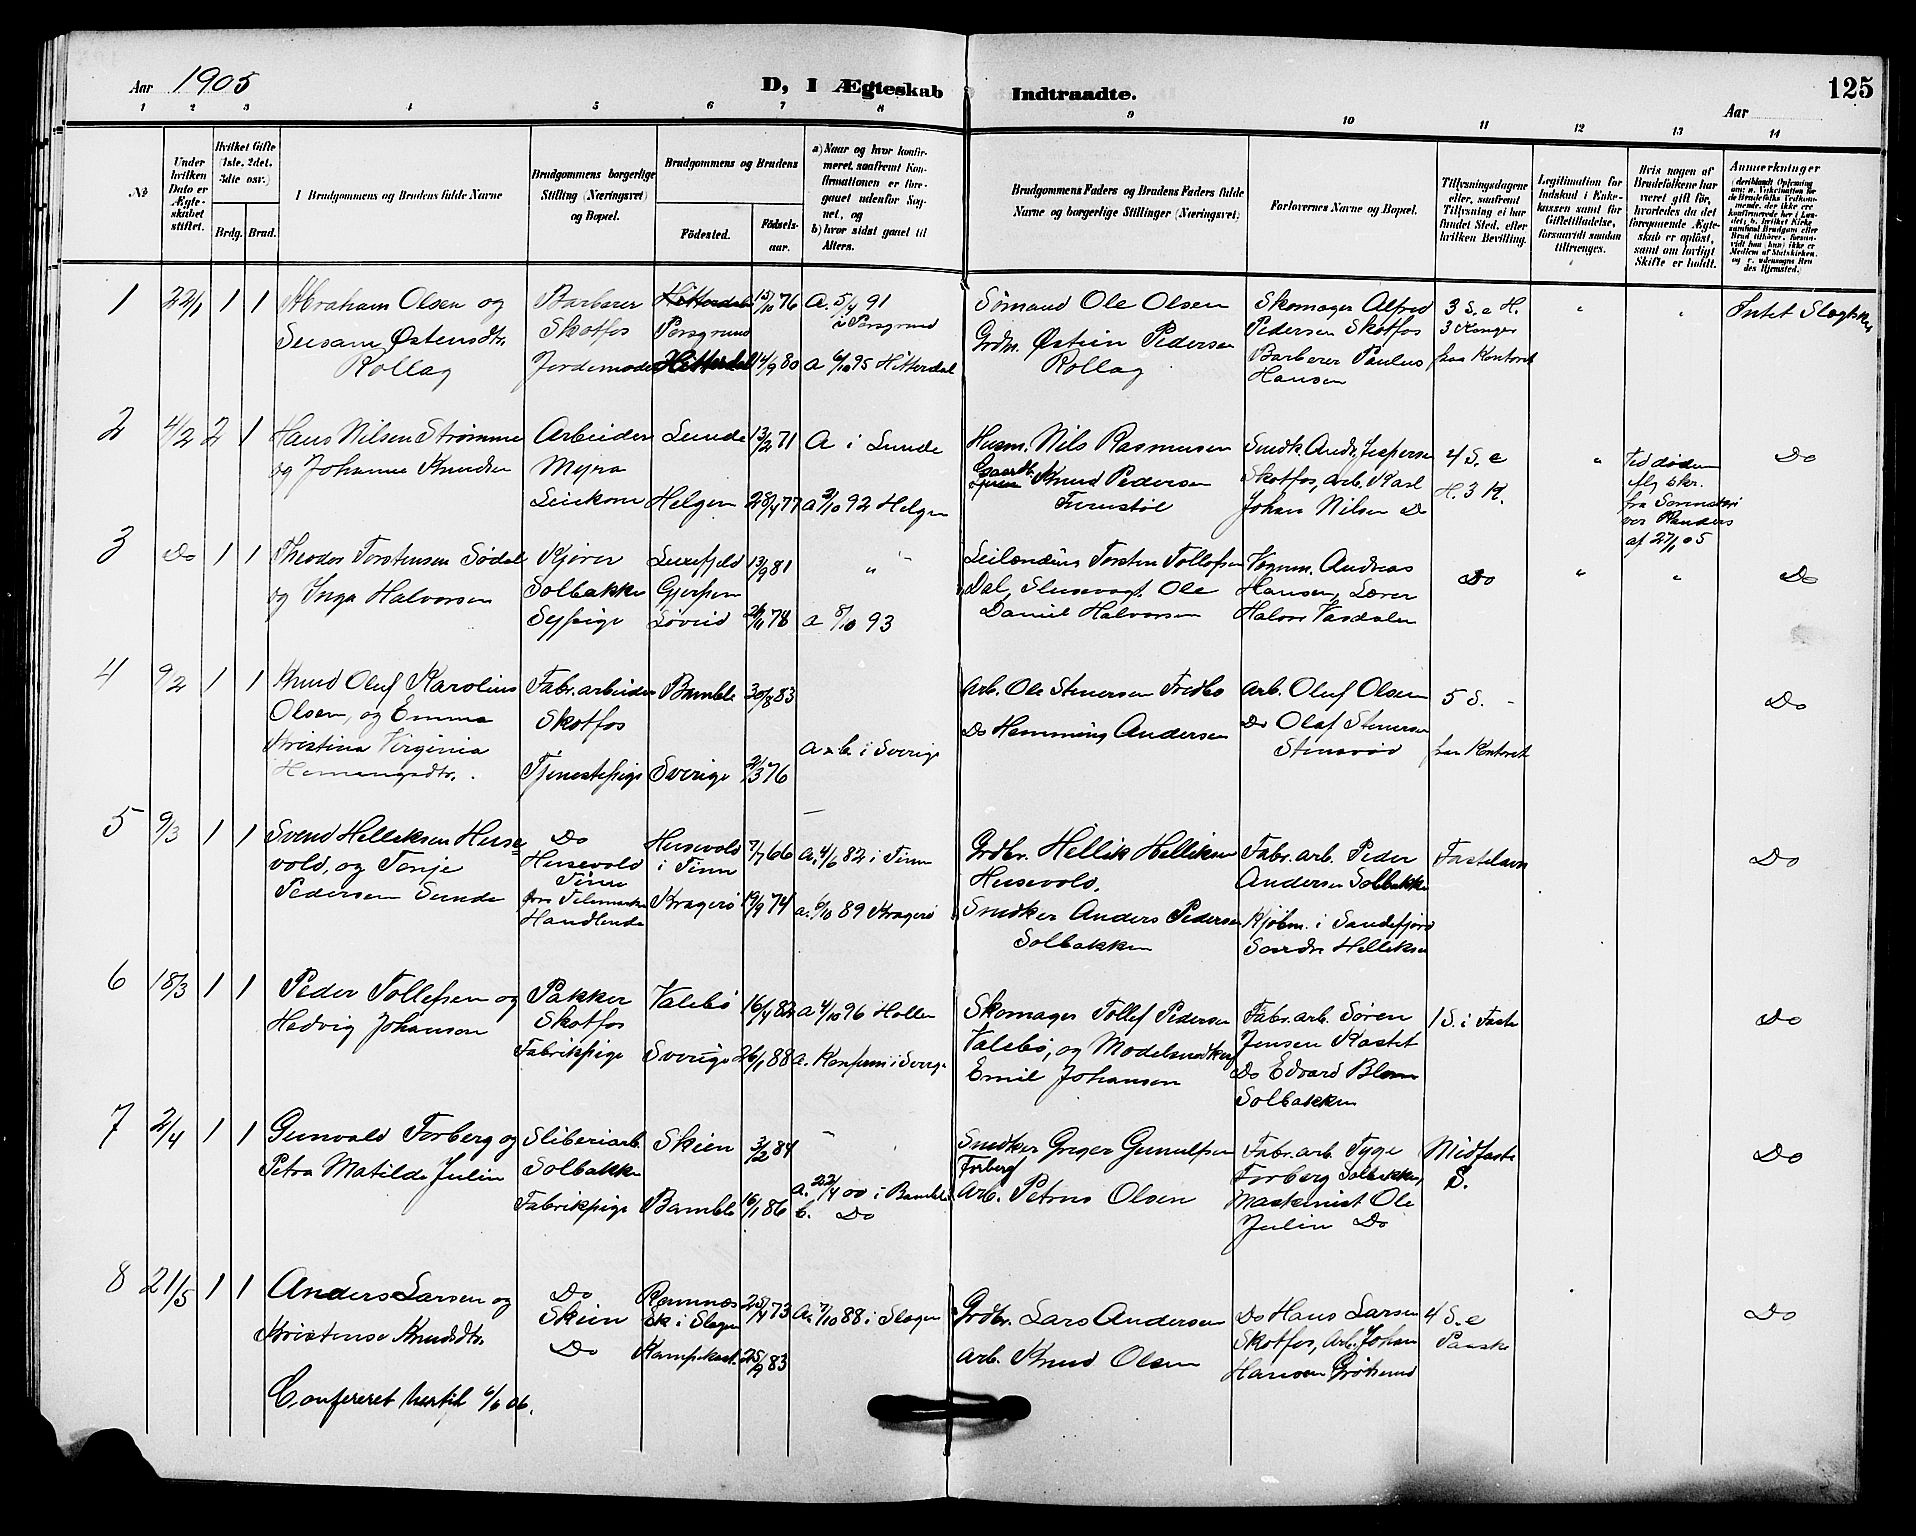 SAKO, Solum kirkebøker, G/Gb/L0004: Klokkerbok nr. II 4, 1898-1905, s. 125